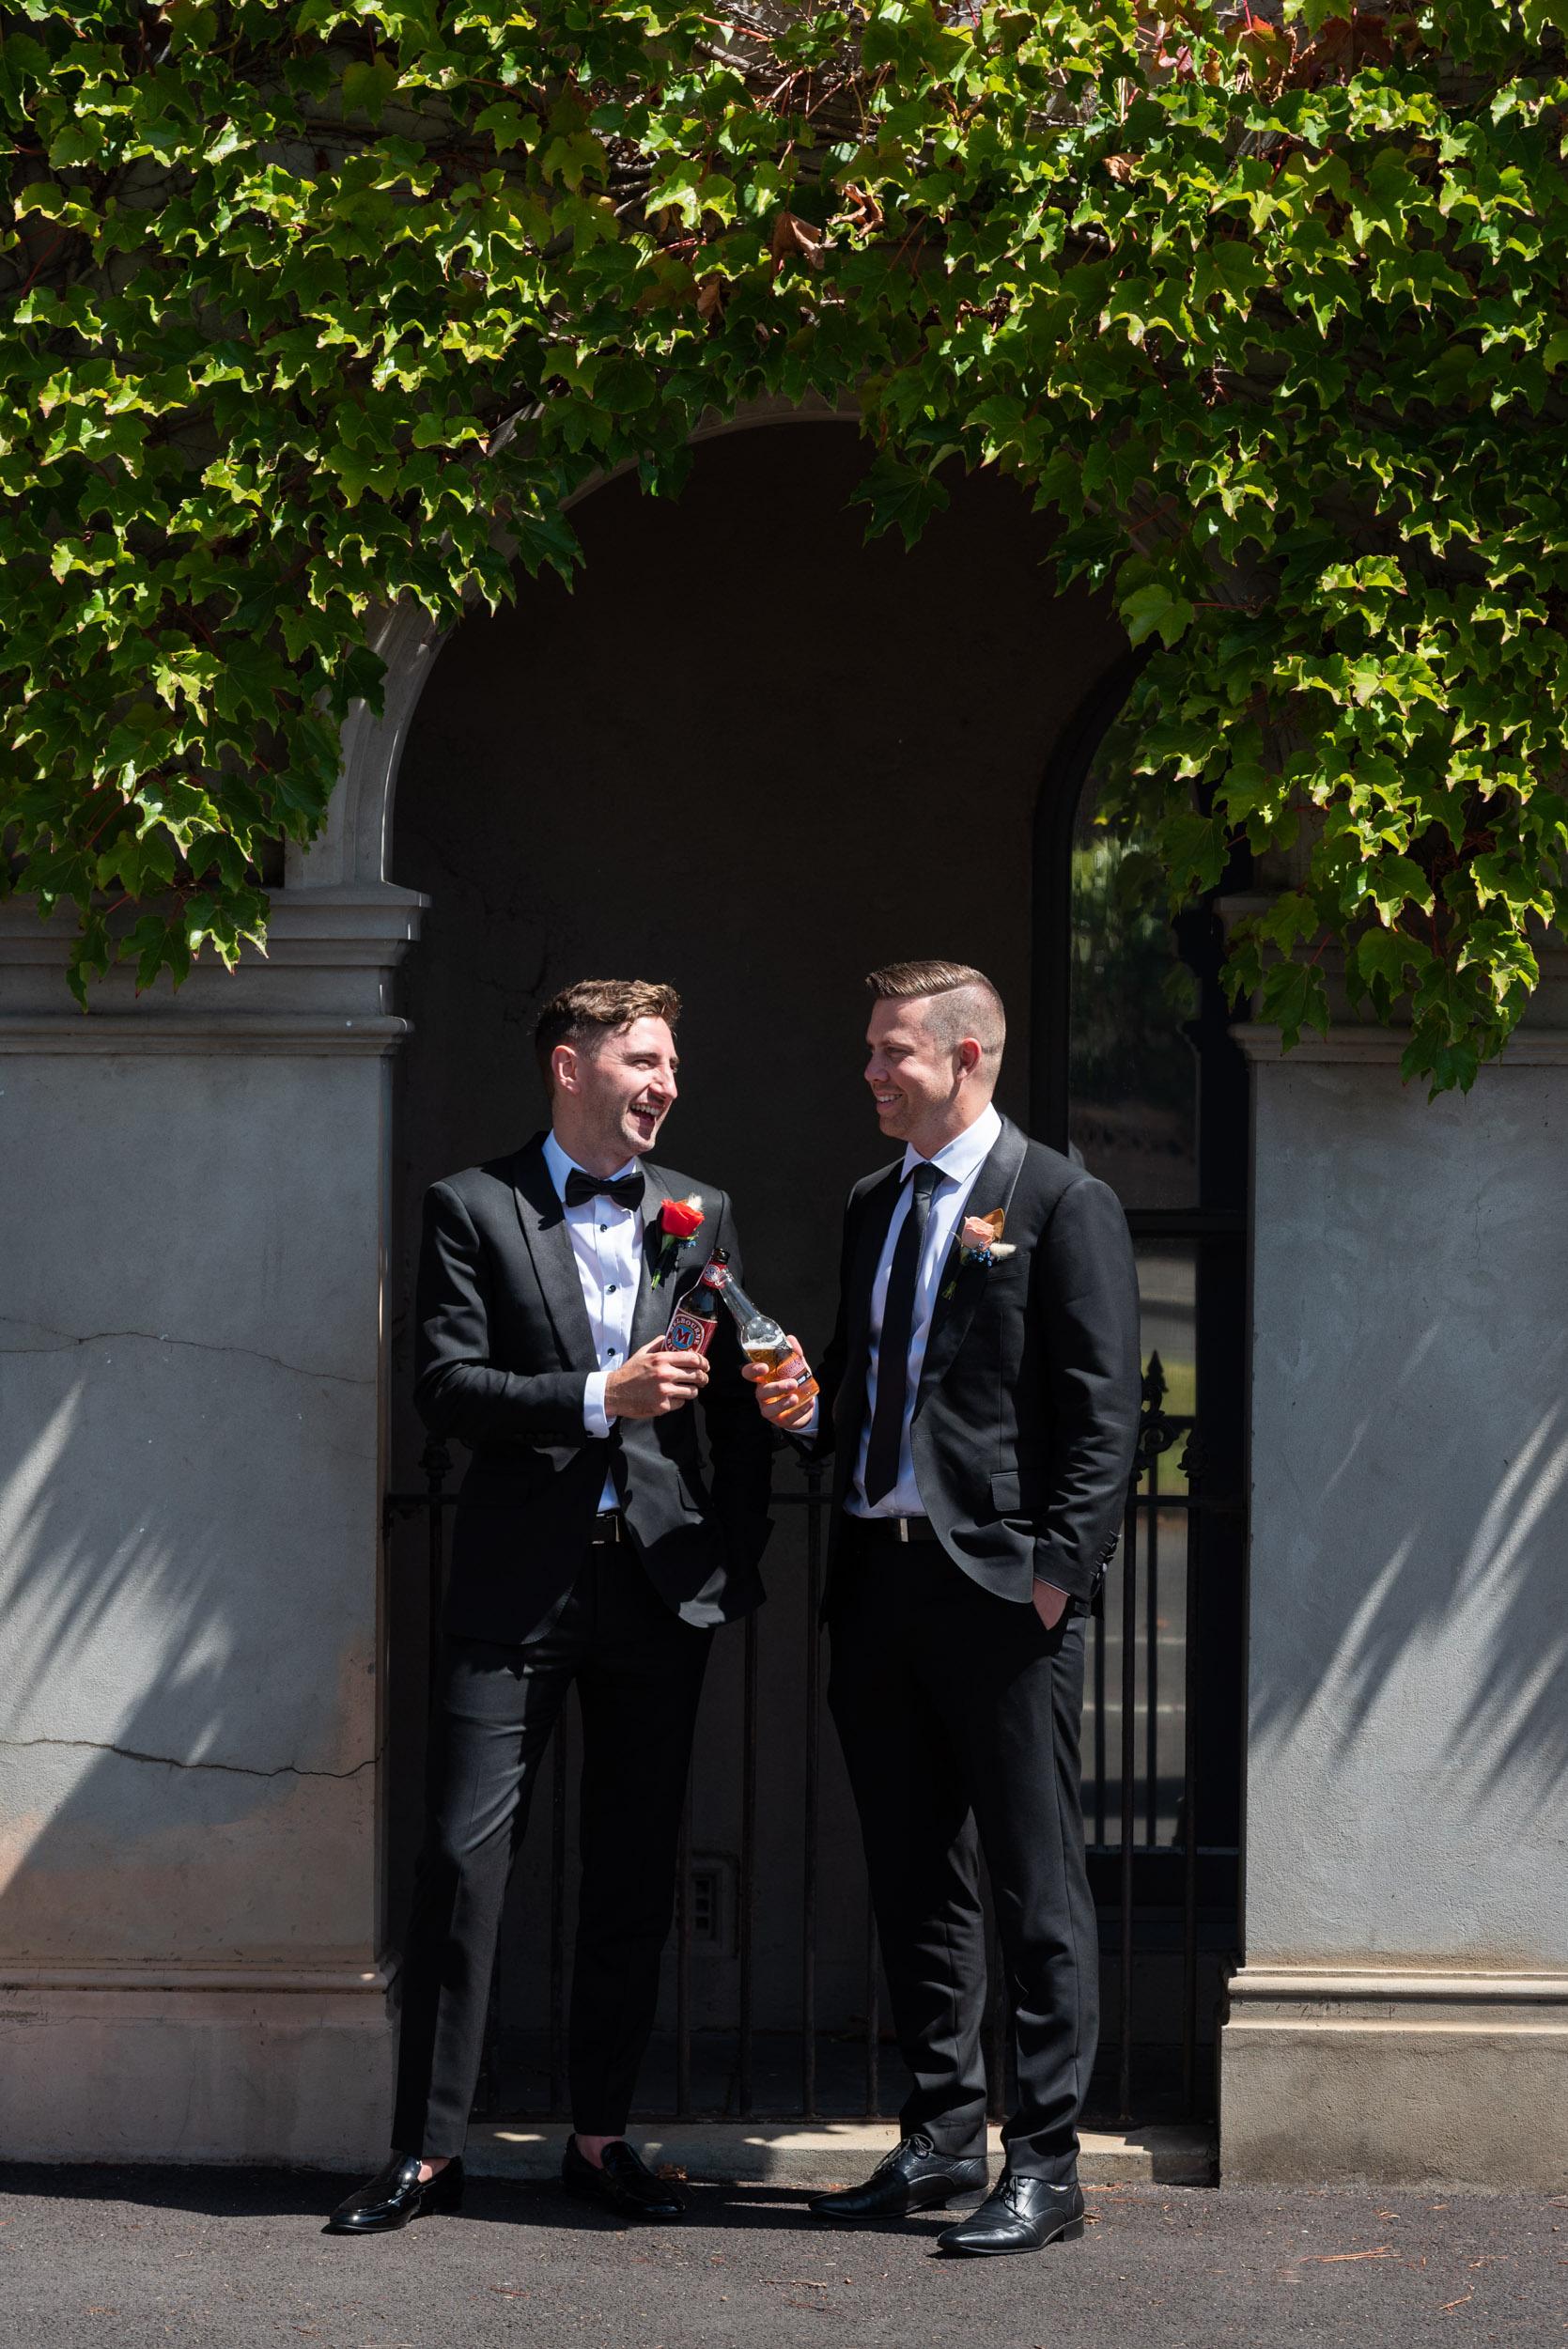 Bridal Shoot, Groom & Best Man, Wedding Suit, Melbourne Wedding, Brad Geddes Photography